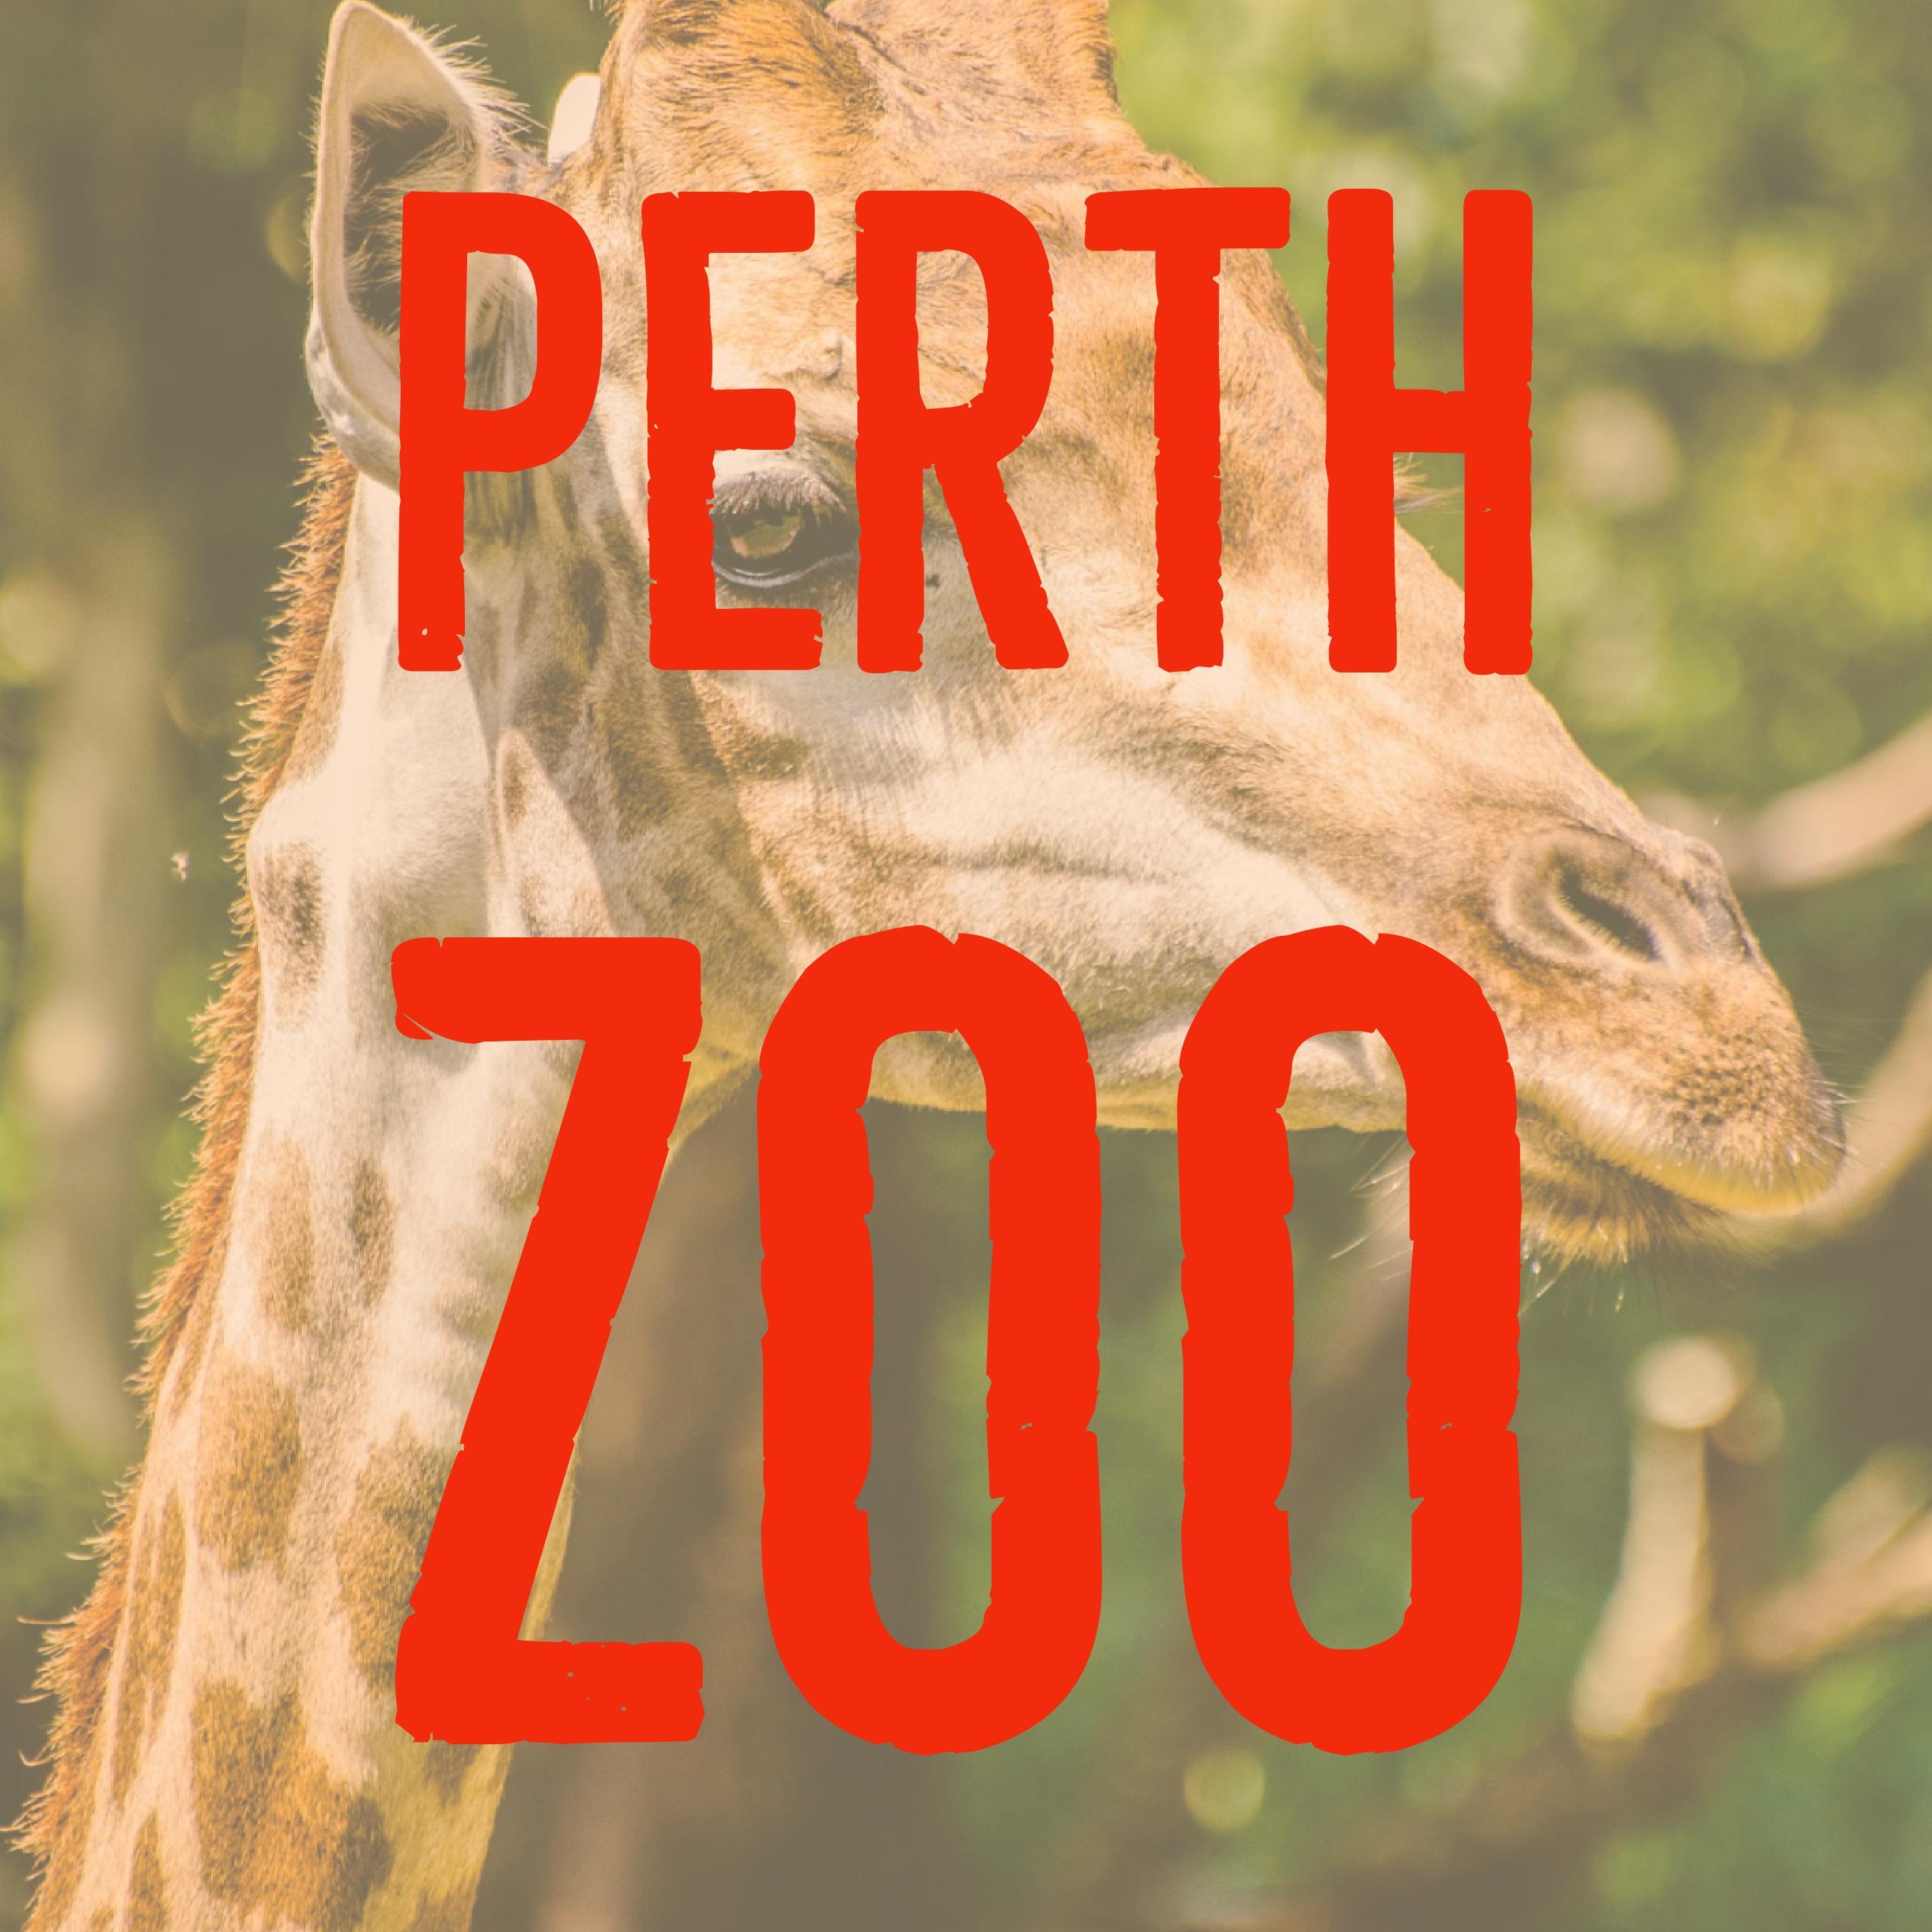 Perth Zoo Excursion